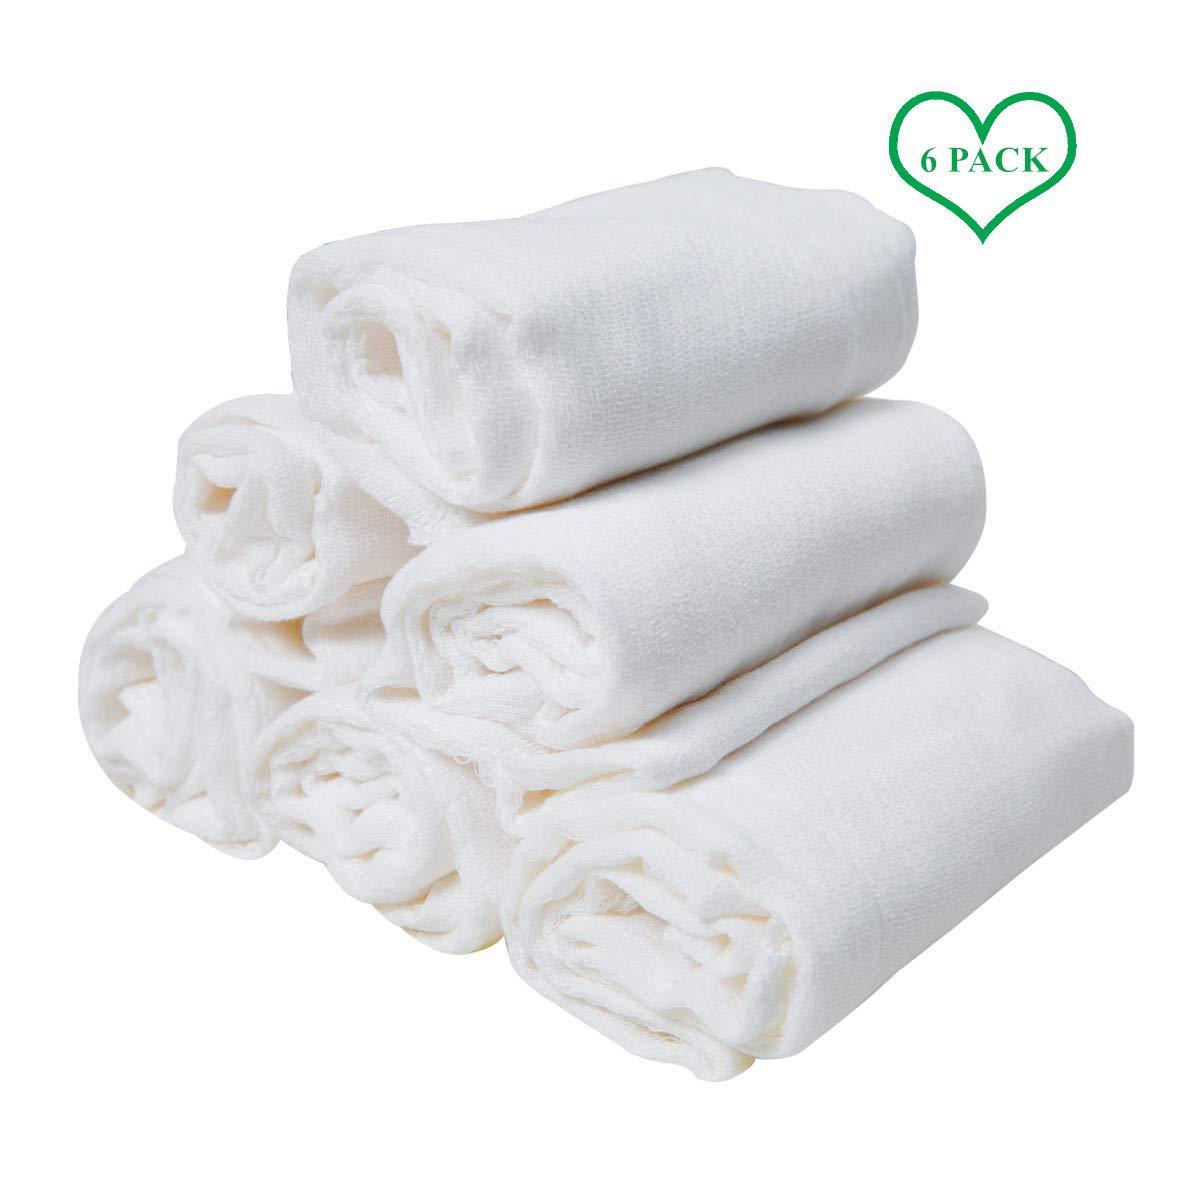 Cotton Cloths Prefold Cloth Diaper